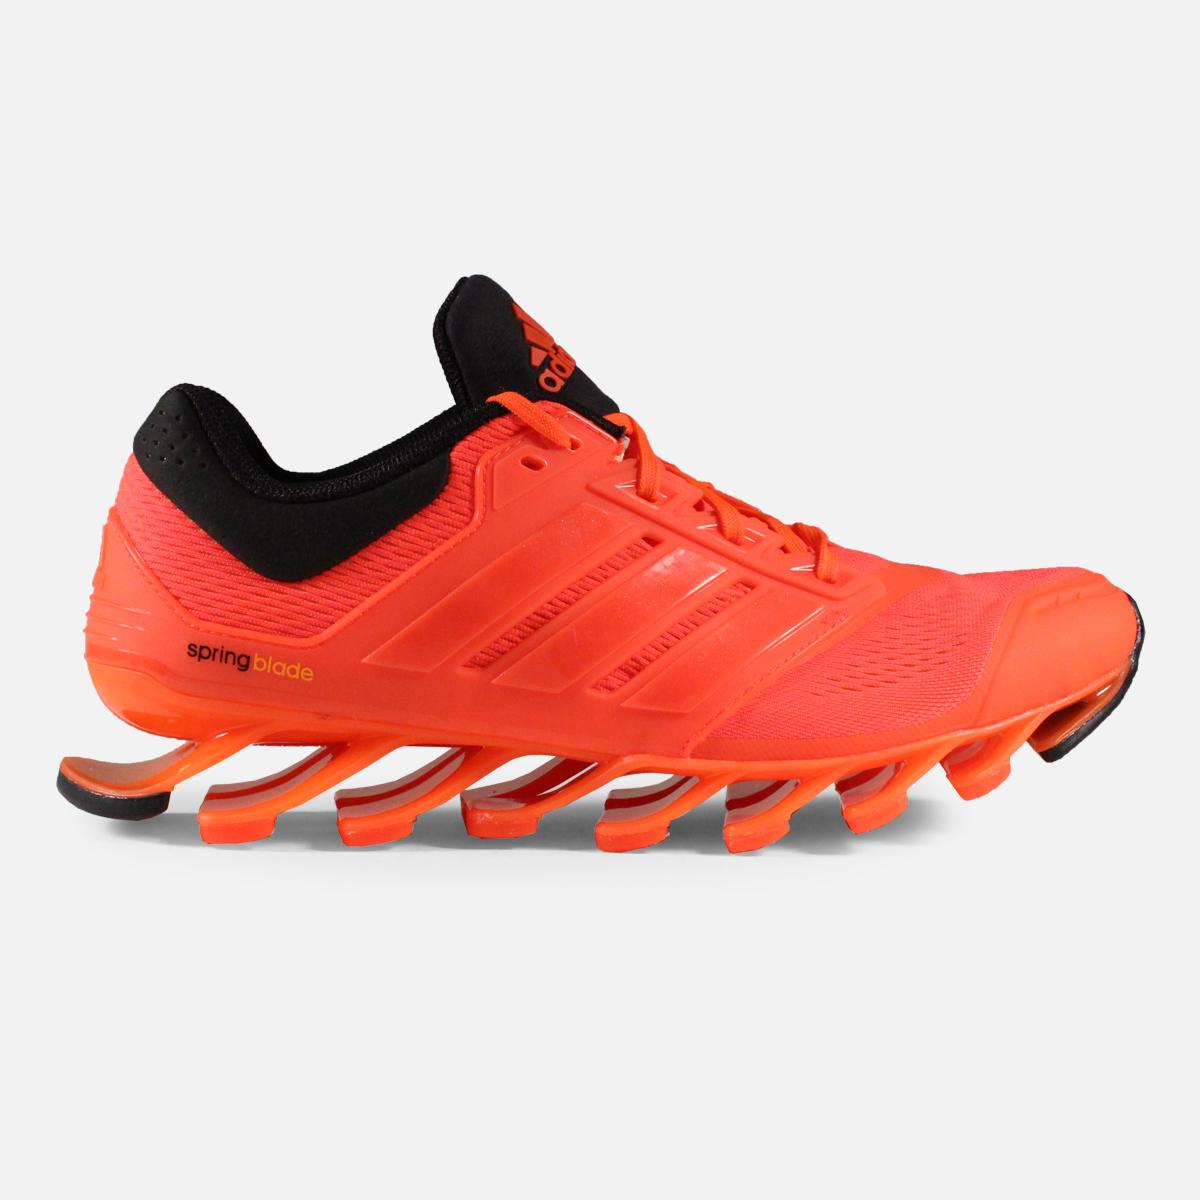 aa380f2debb wholesale sepatu running adidas springblade drive m d73957 original 100  bnib . 1de97 e21fe